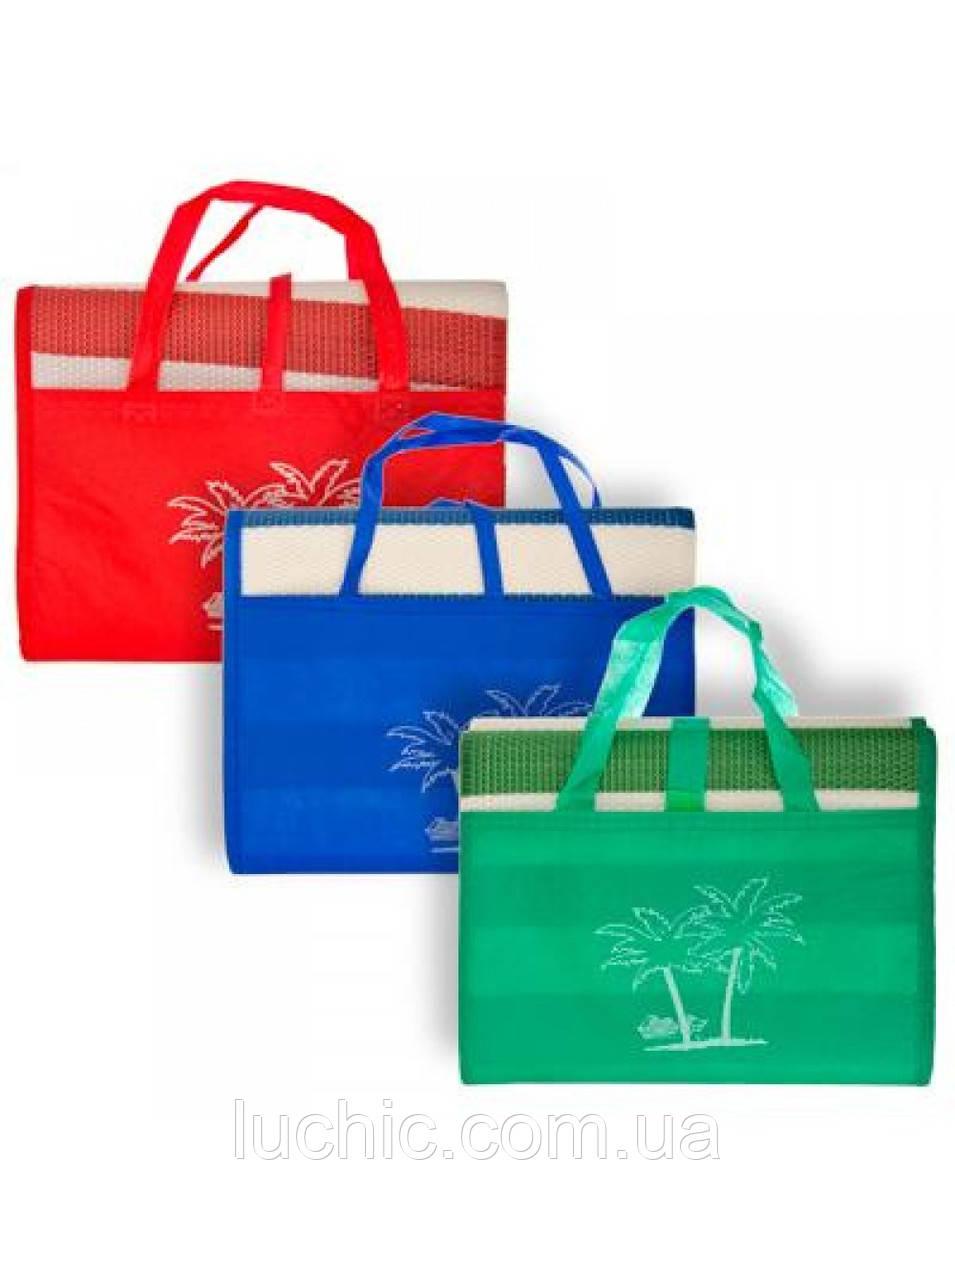 Коврик-сумка 170/90 см  материал  полипропилен